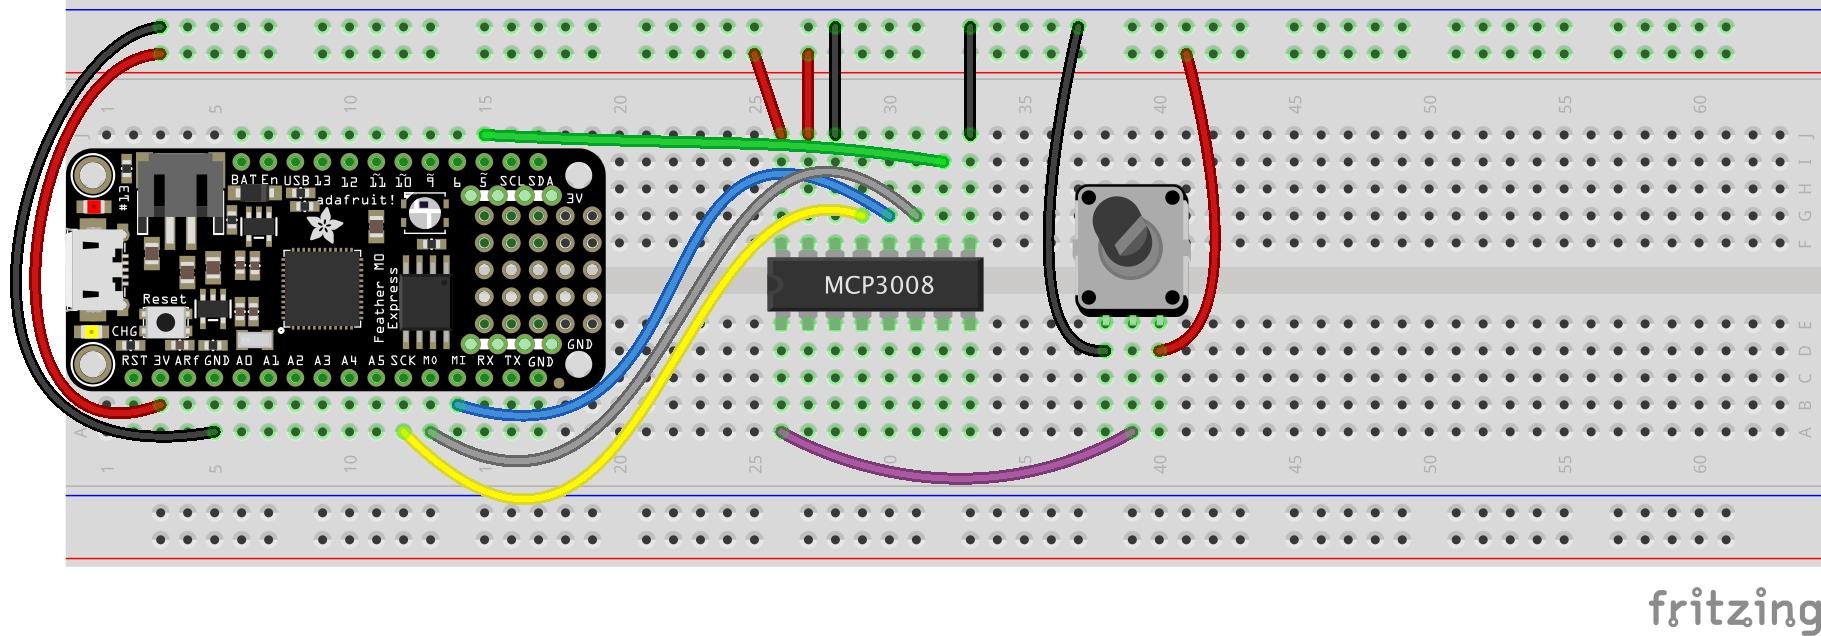 adafruit_products_FeatherM0_MCP3008_SPI_bb.jpg